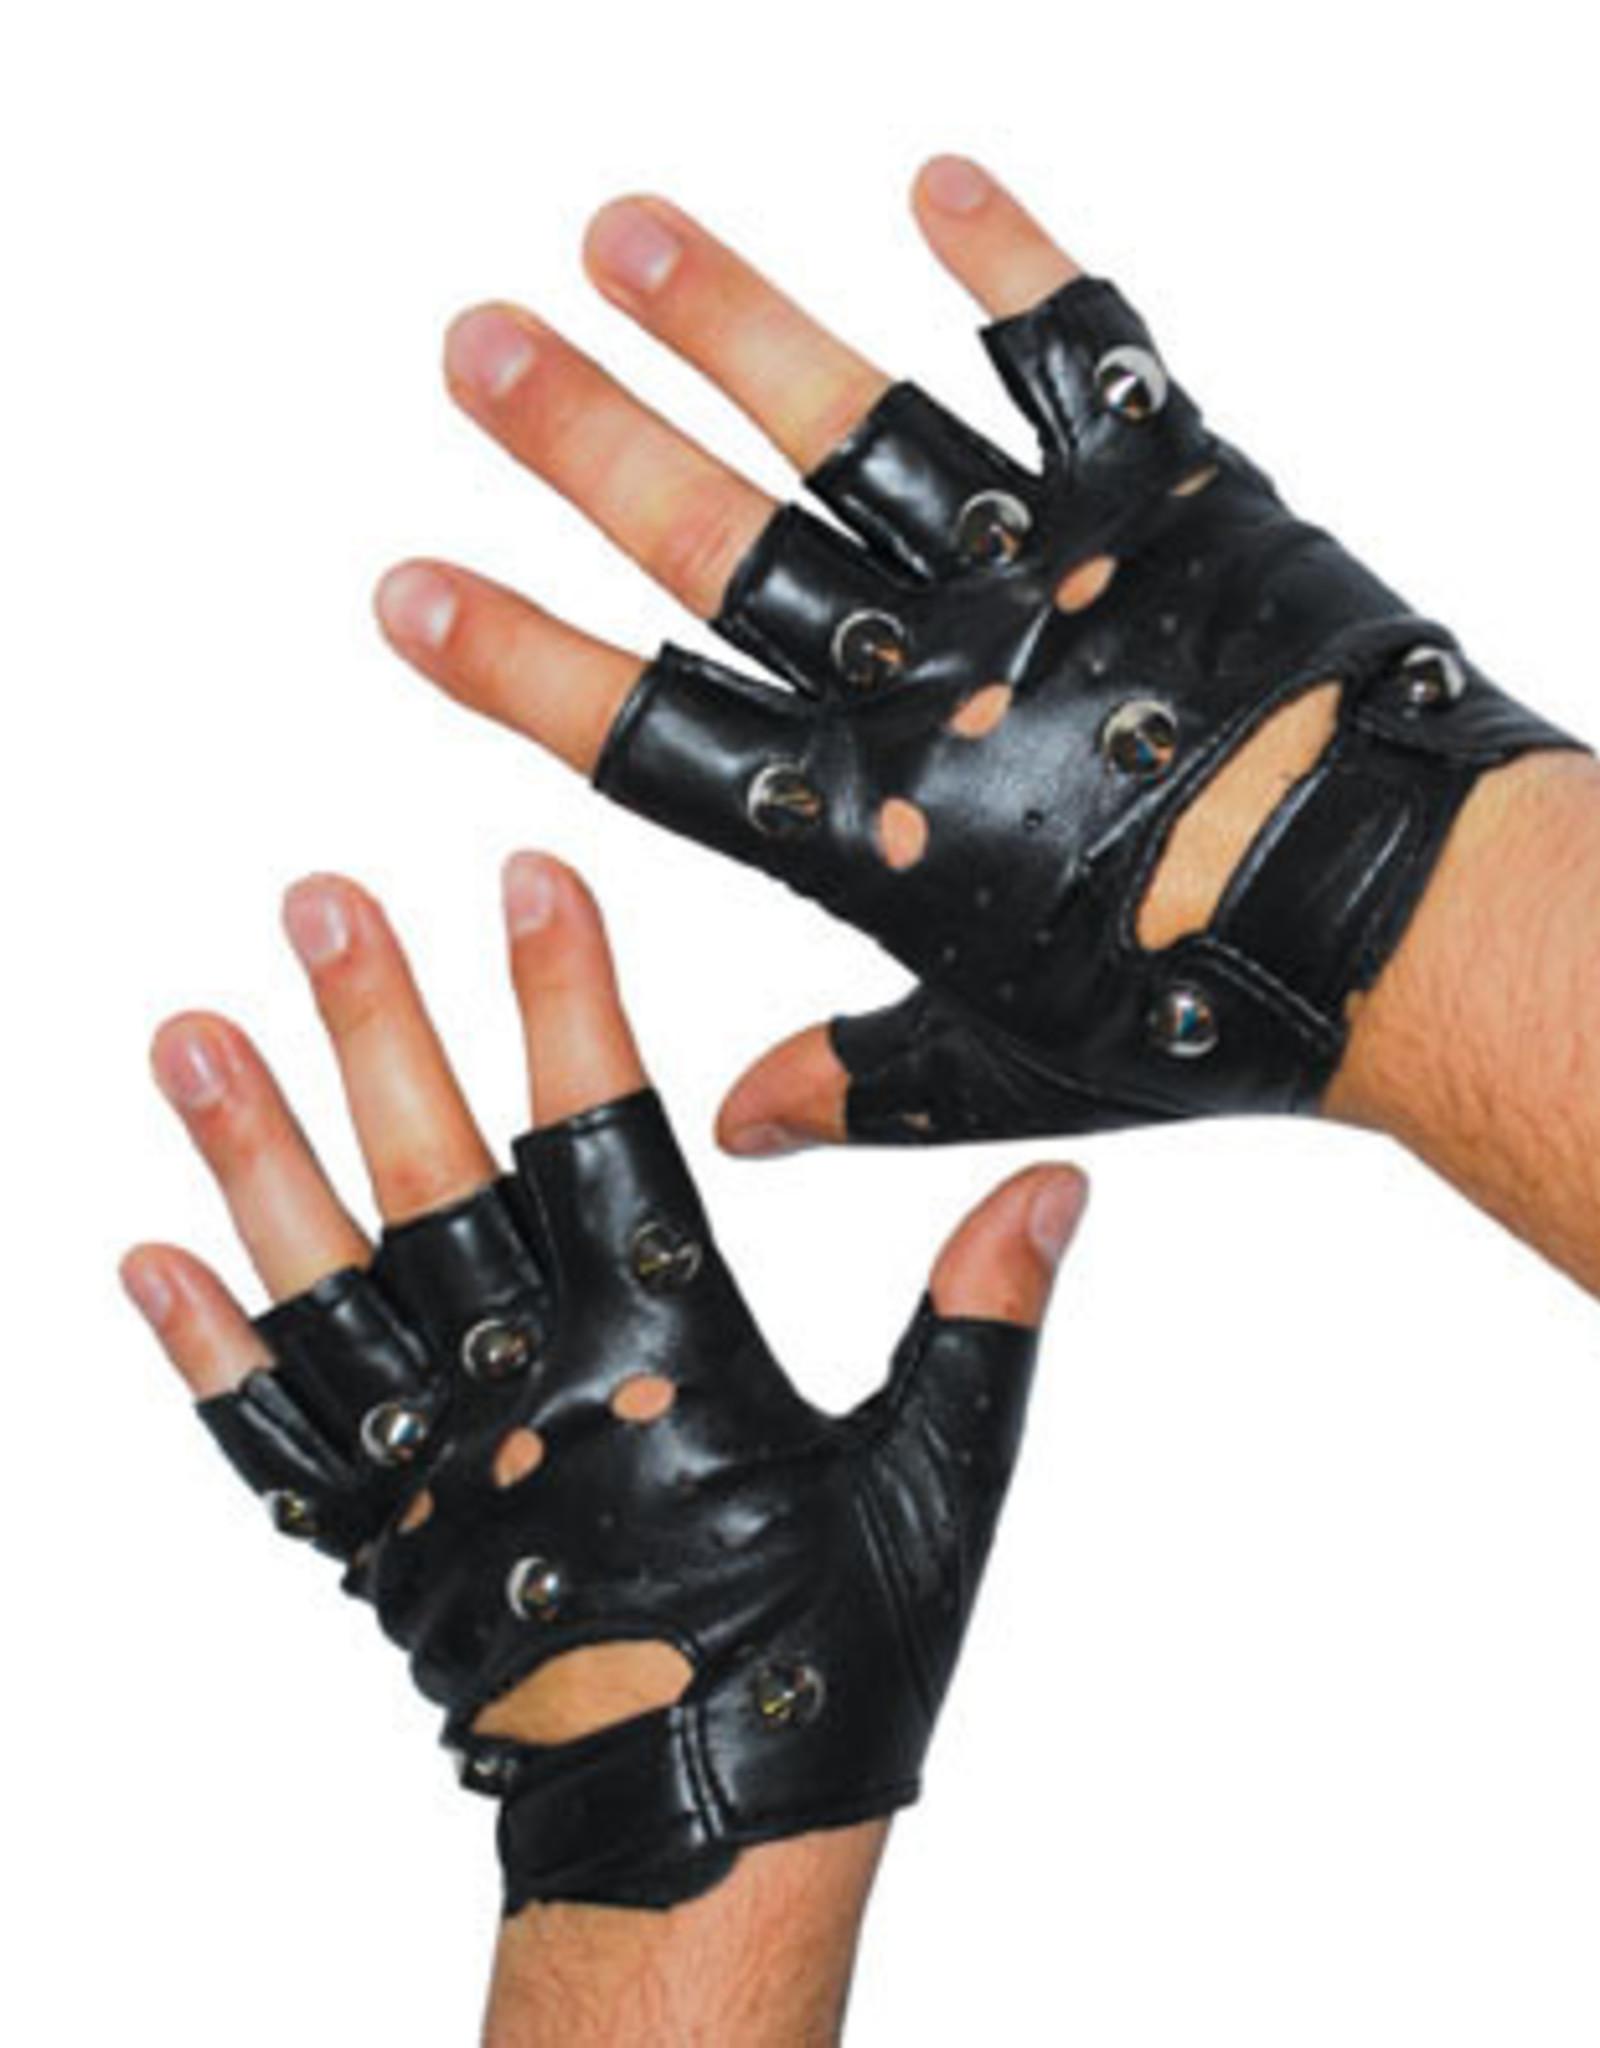 ESPA punk handschoenen